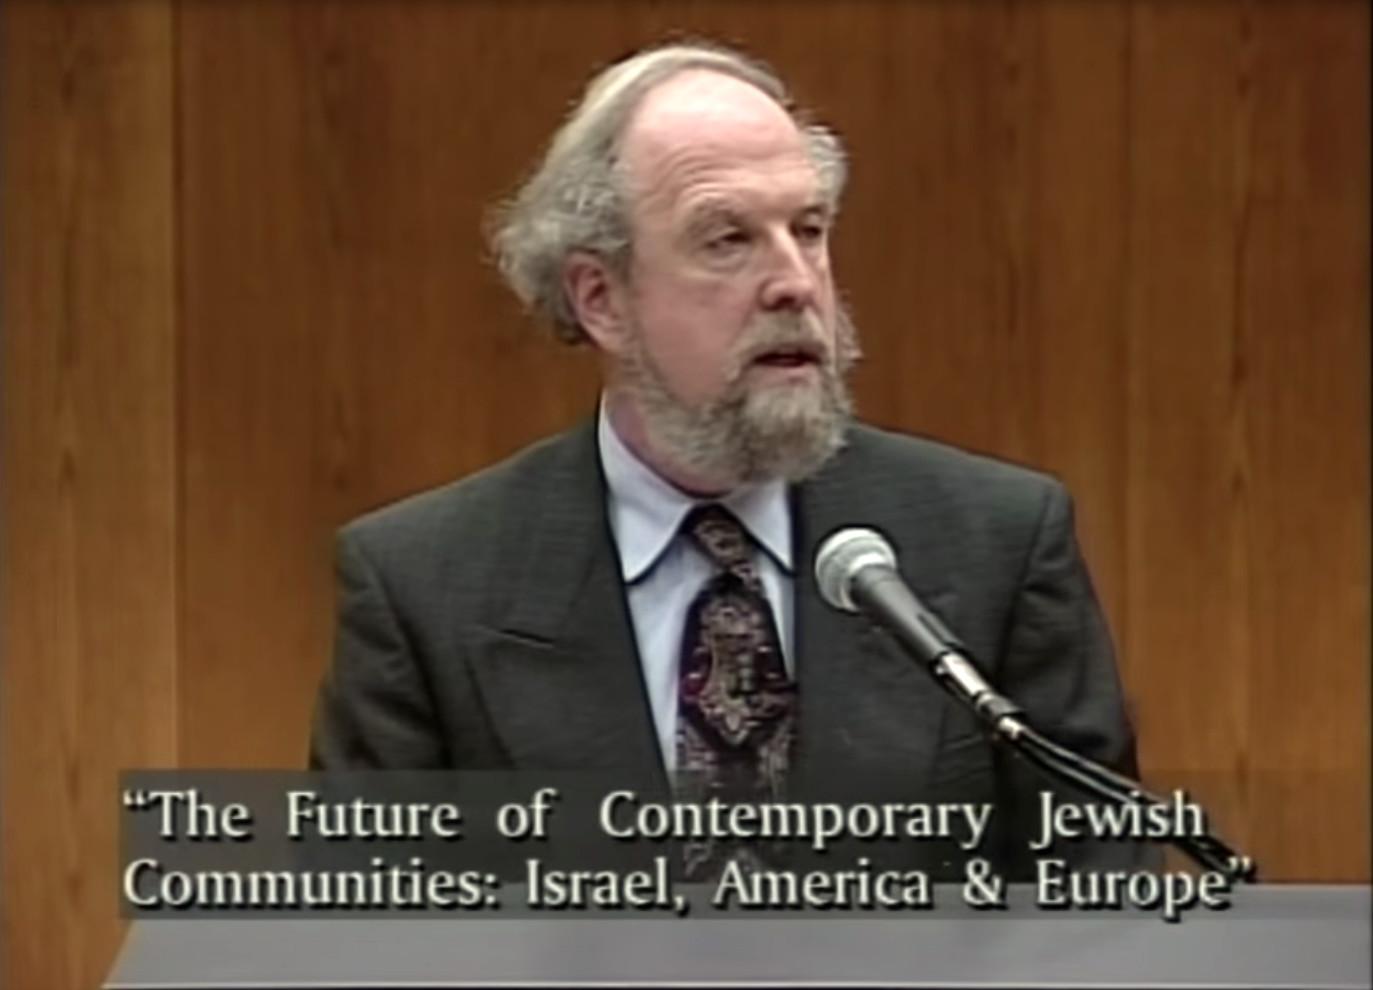 Calvin Goldscheider: Studying the Jewish Future